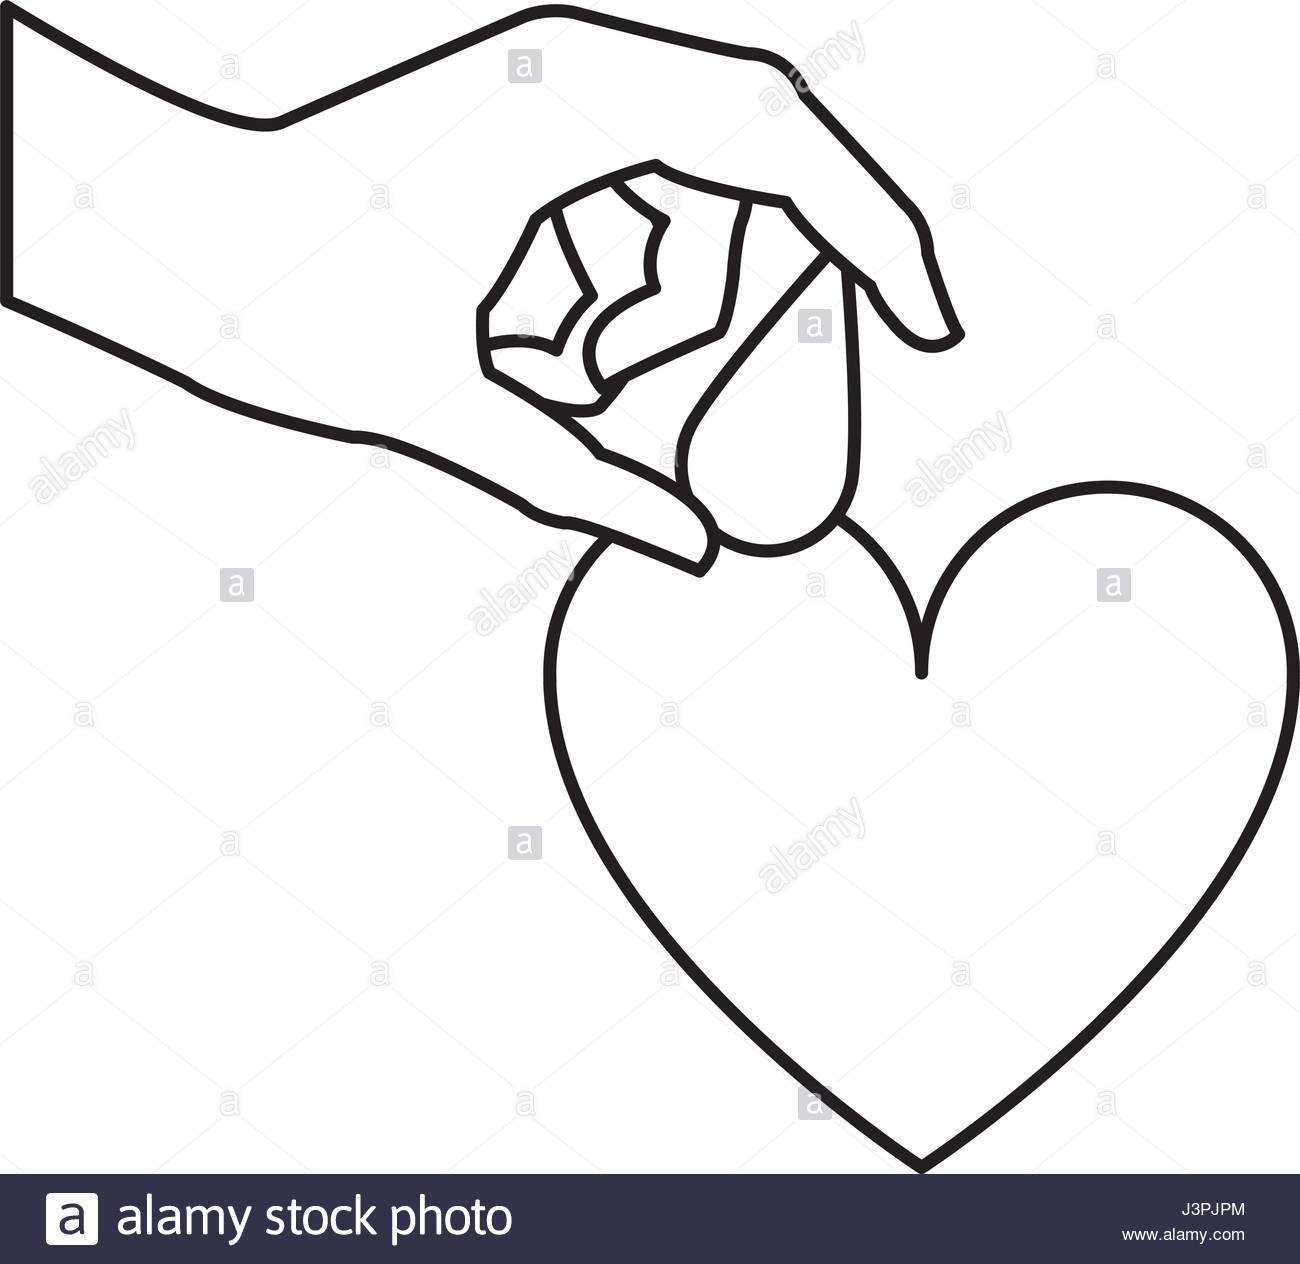 1300x1264 Hand Holding Drop Blood Heart Donation Line Stock Vector Art